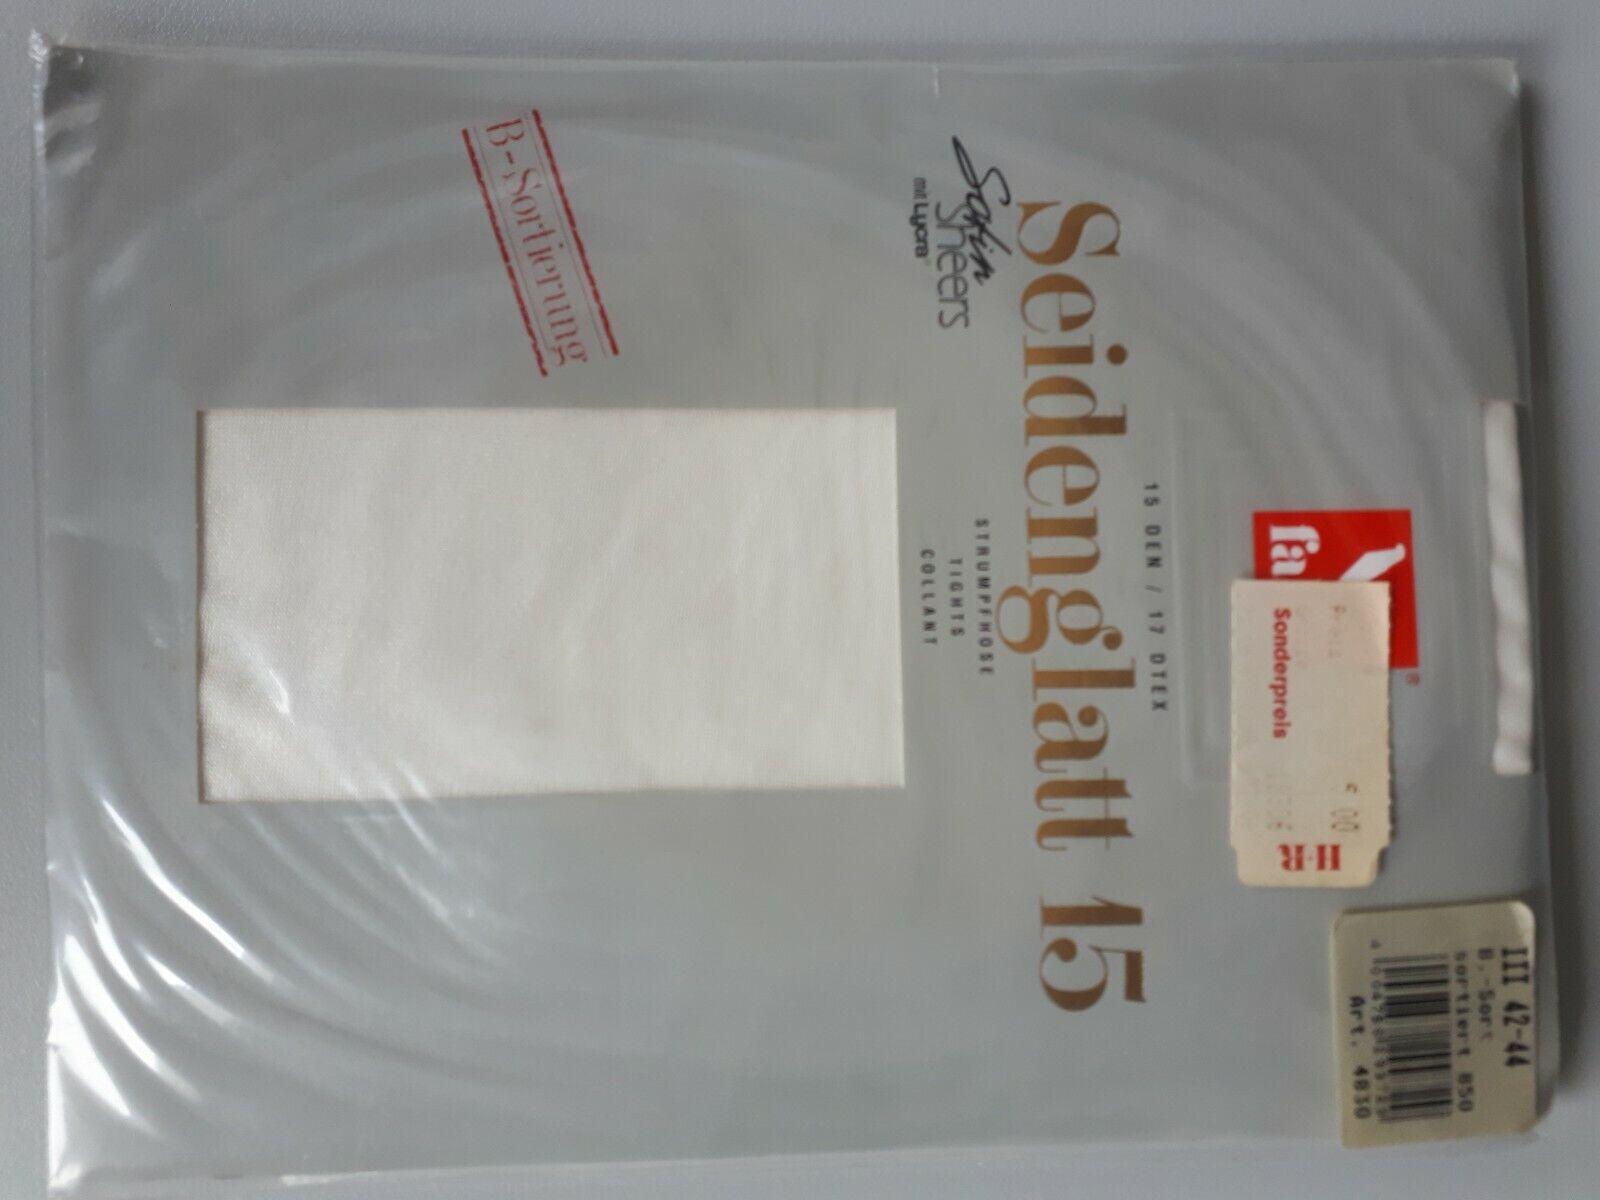 Falke Seidenglatt 15 Feinstrumpfhose Gr 36/38 schwarz wie samt und Seide elegant